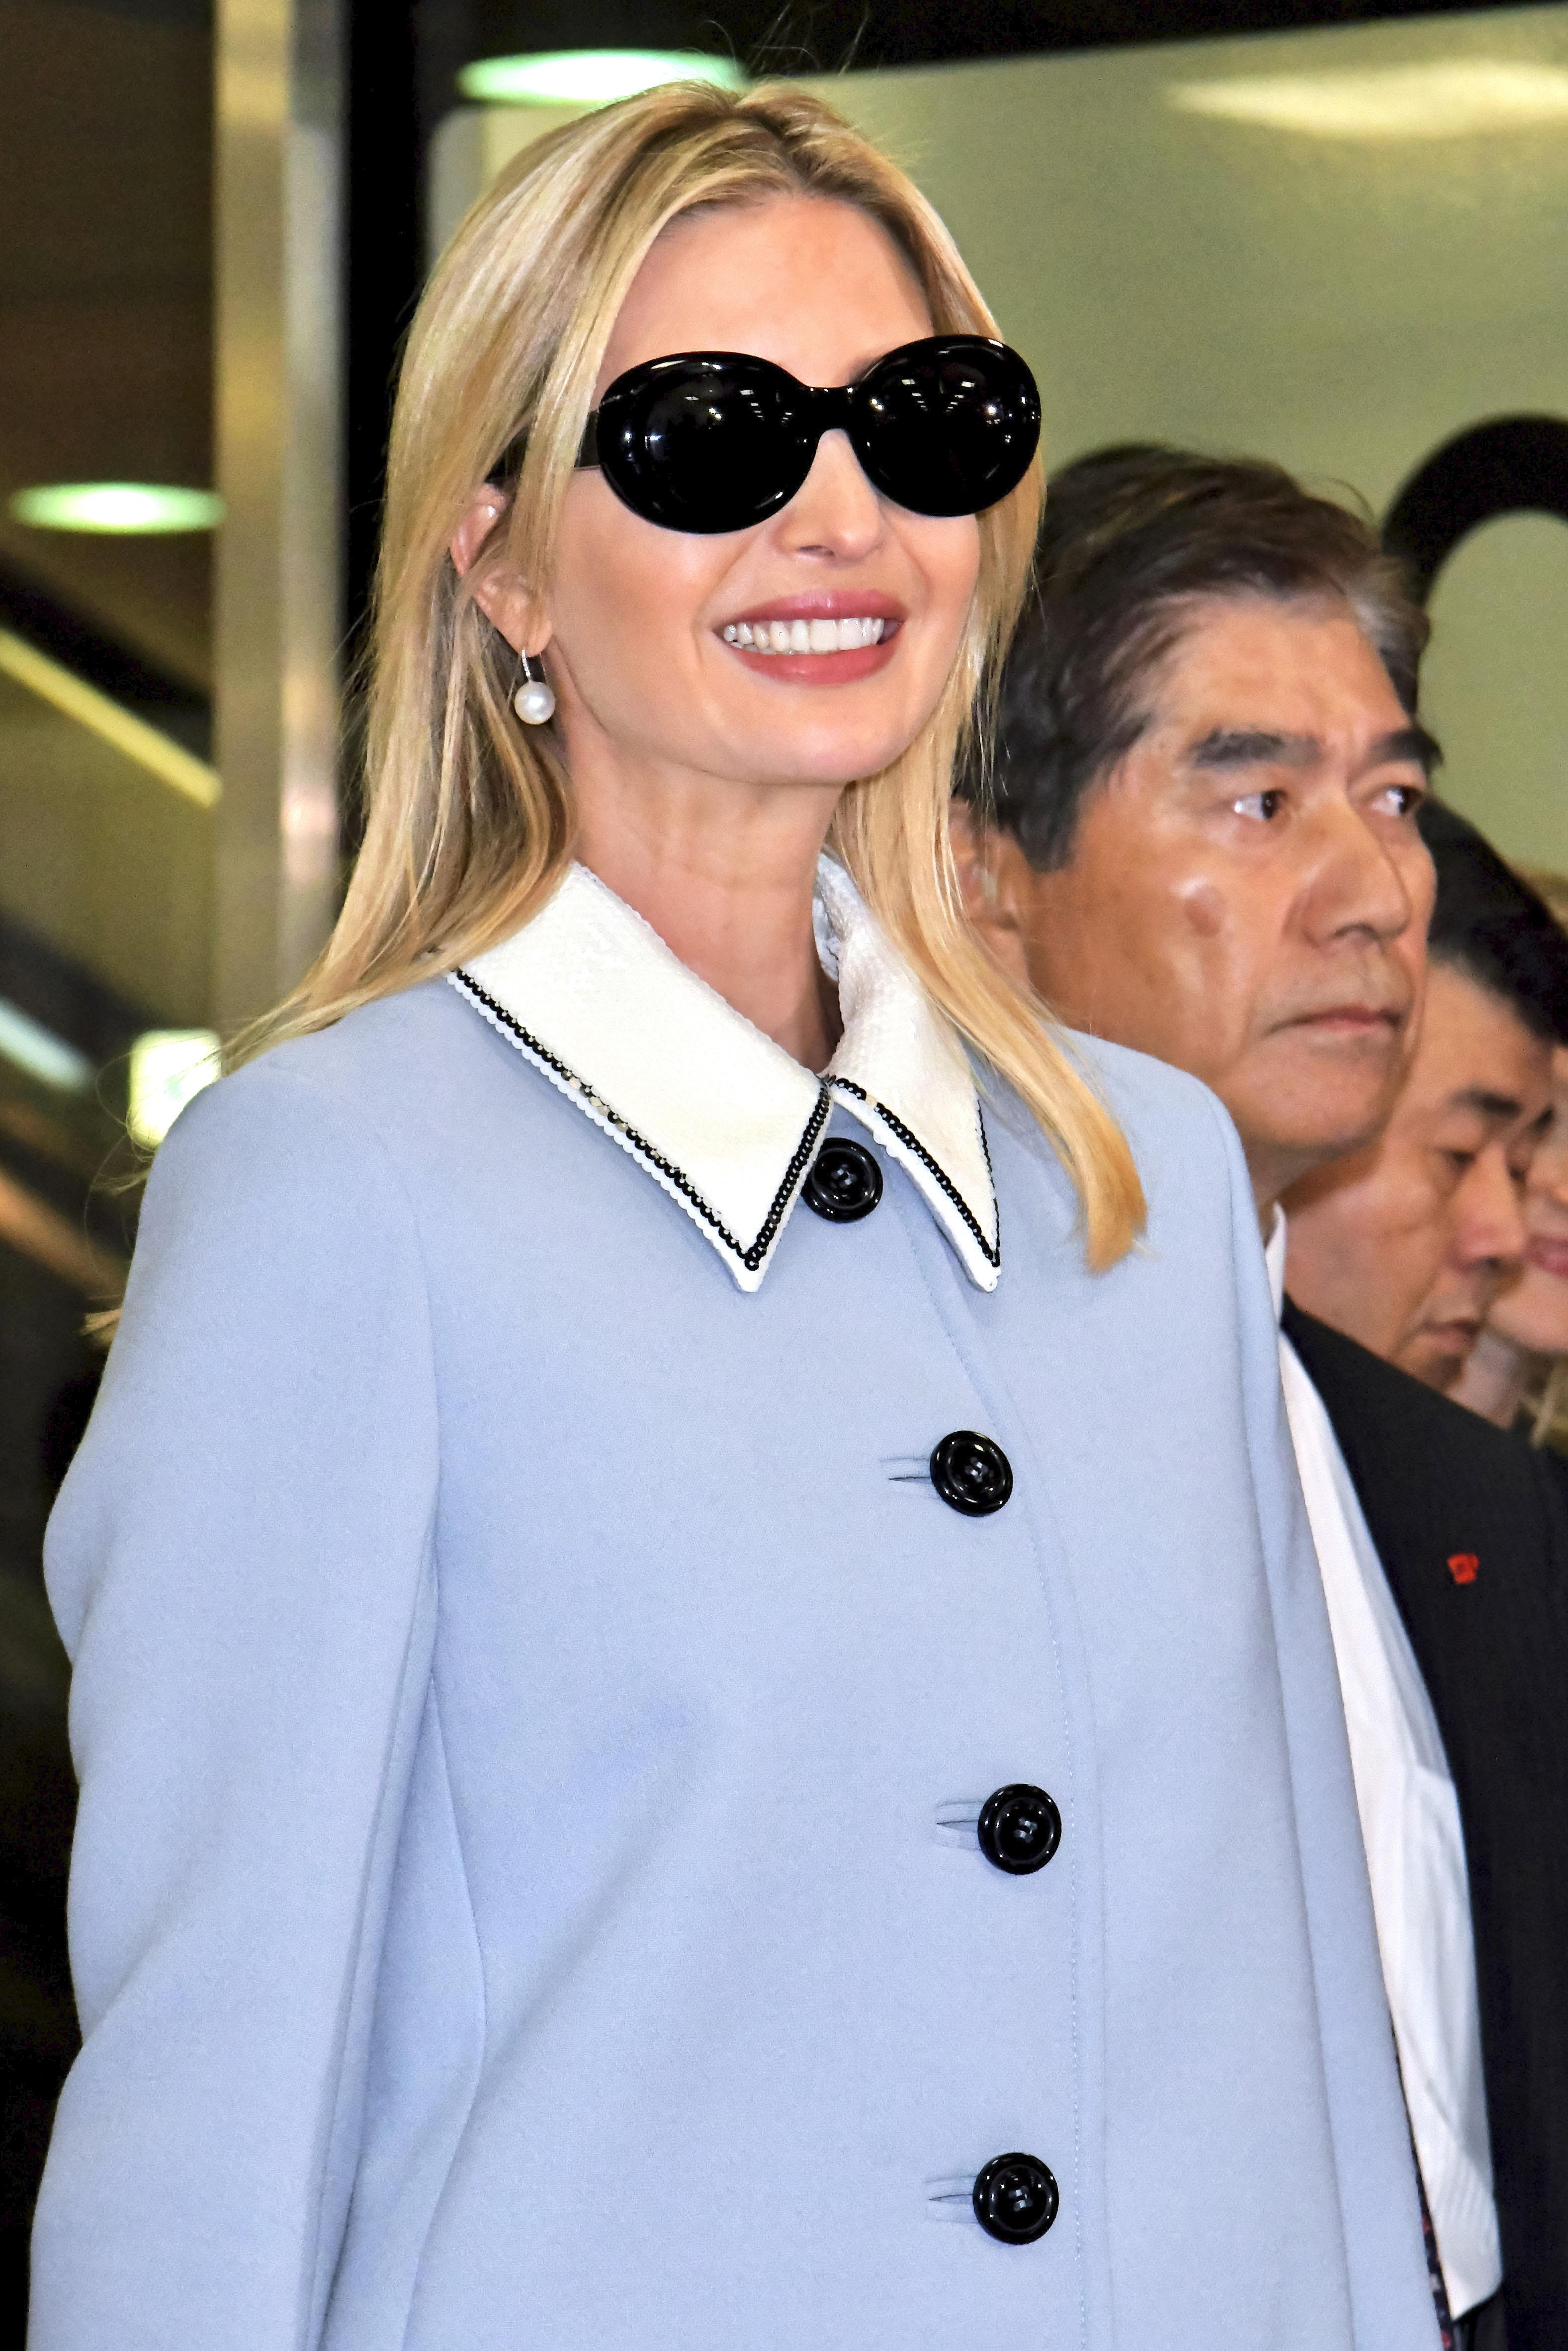 Ivanka Trump Very Stylish in a Blue Coat in Japan